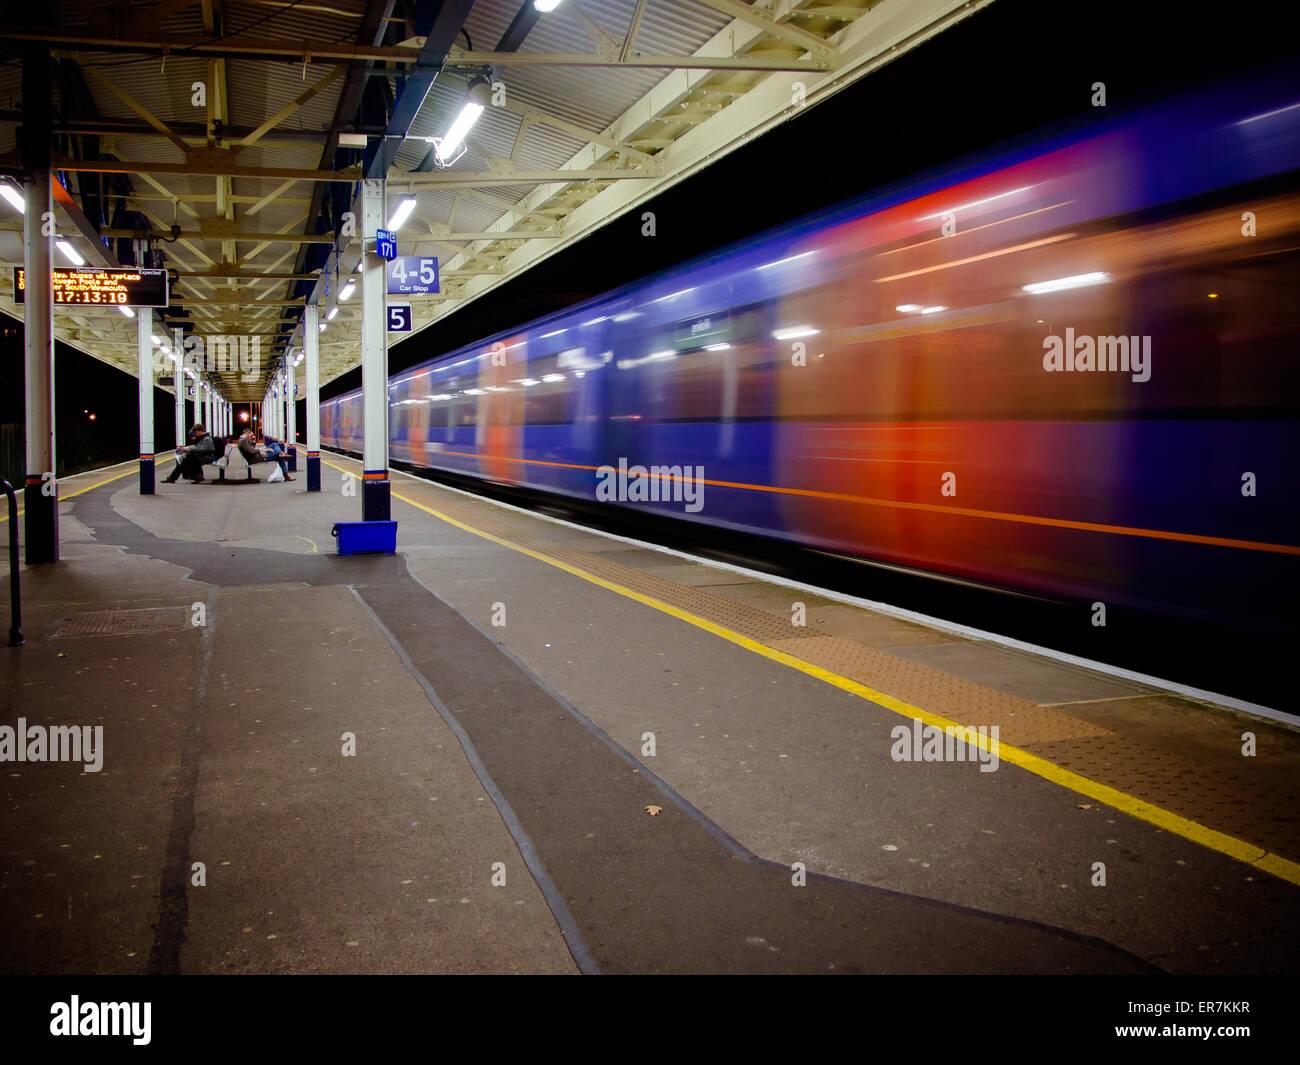 A train speeding through a train station - Stock Image